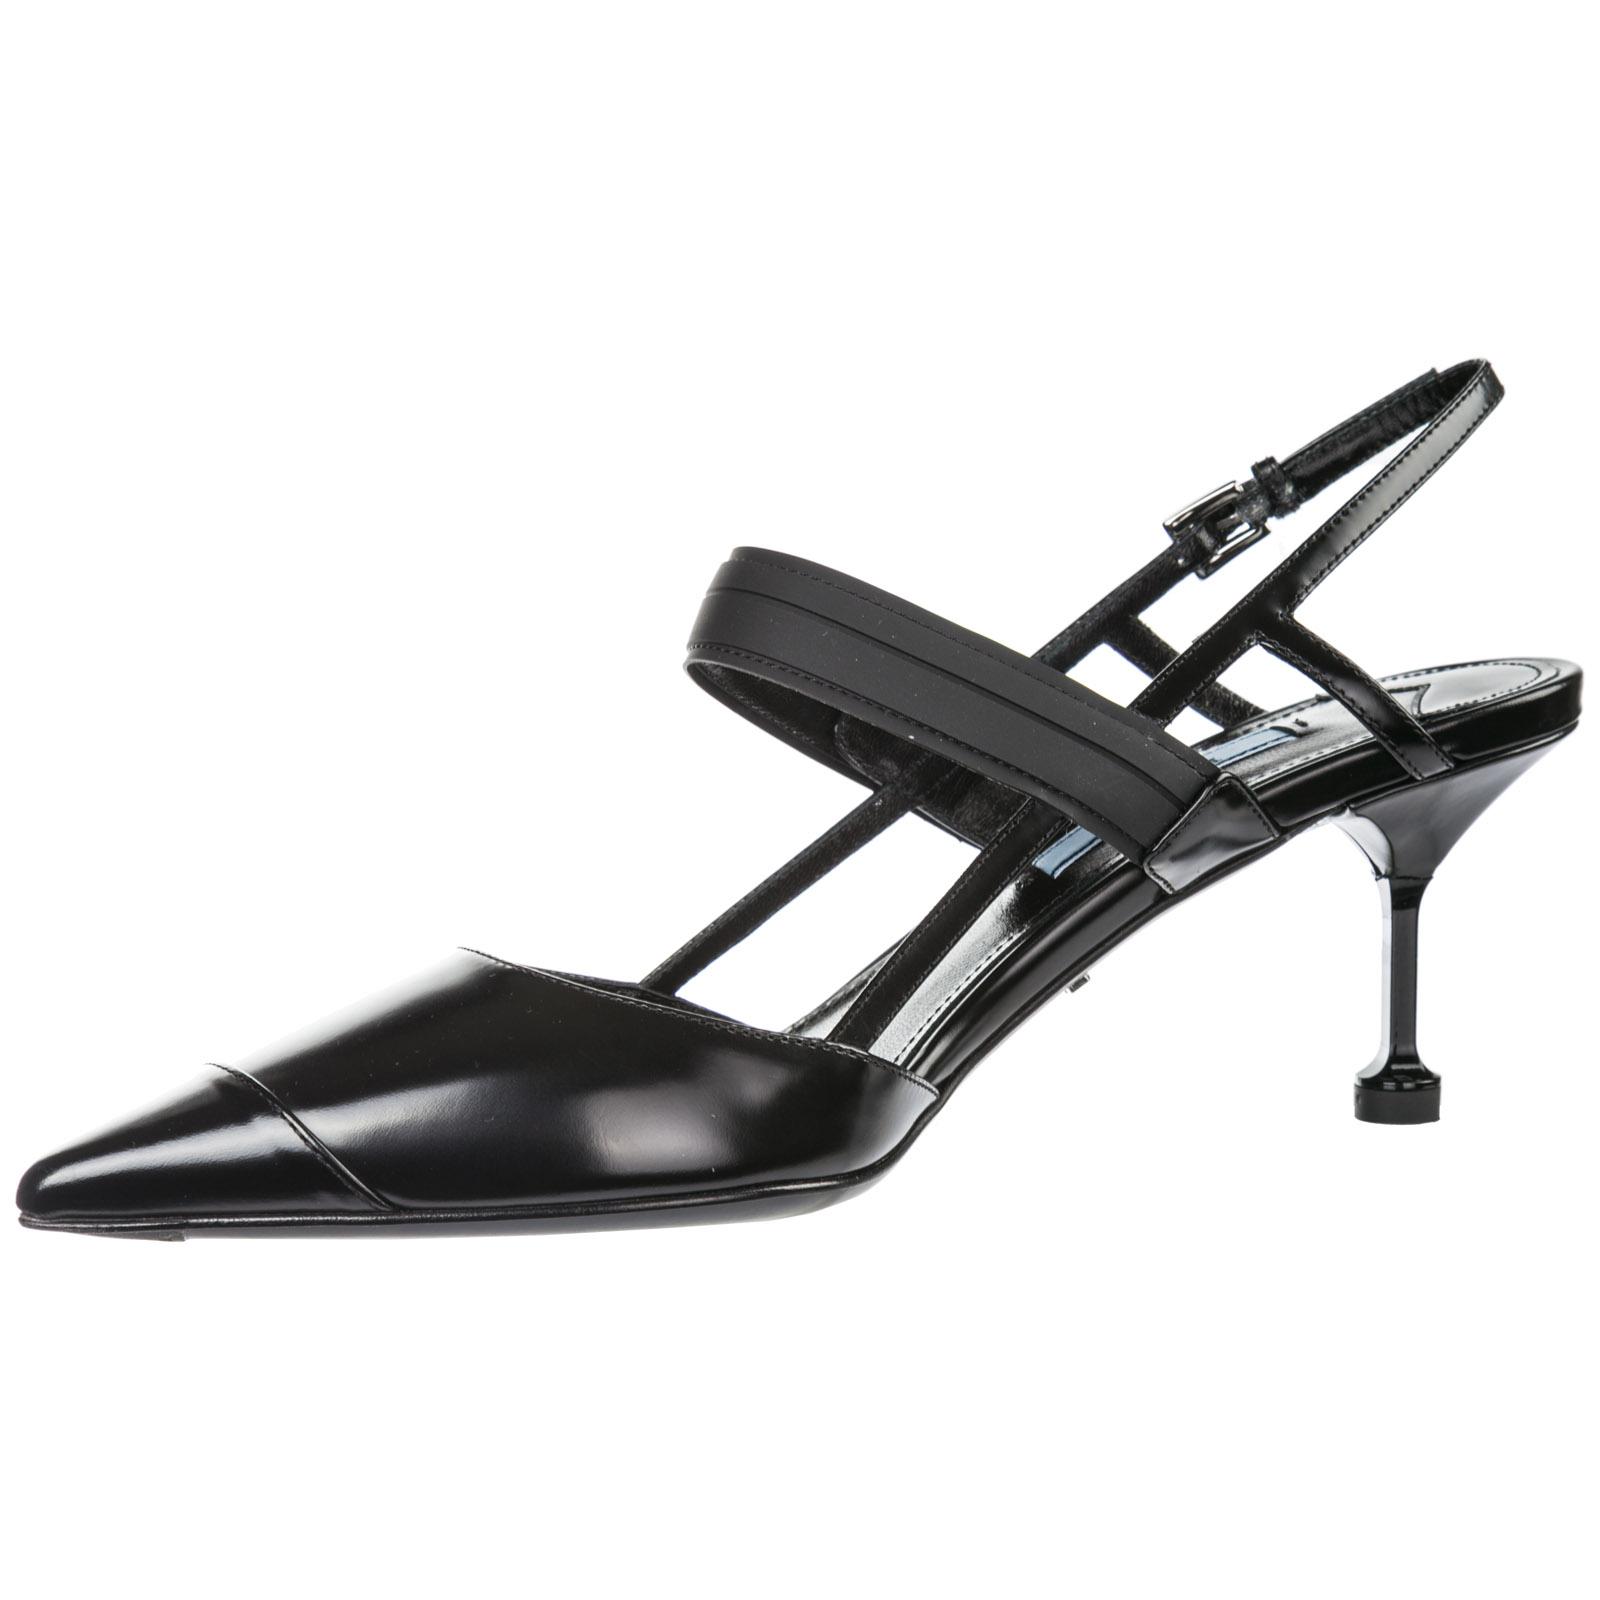 Women's leather pumps court shoes high heel opanca